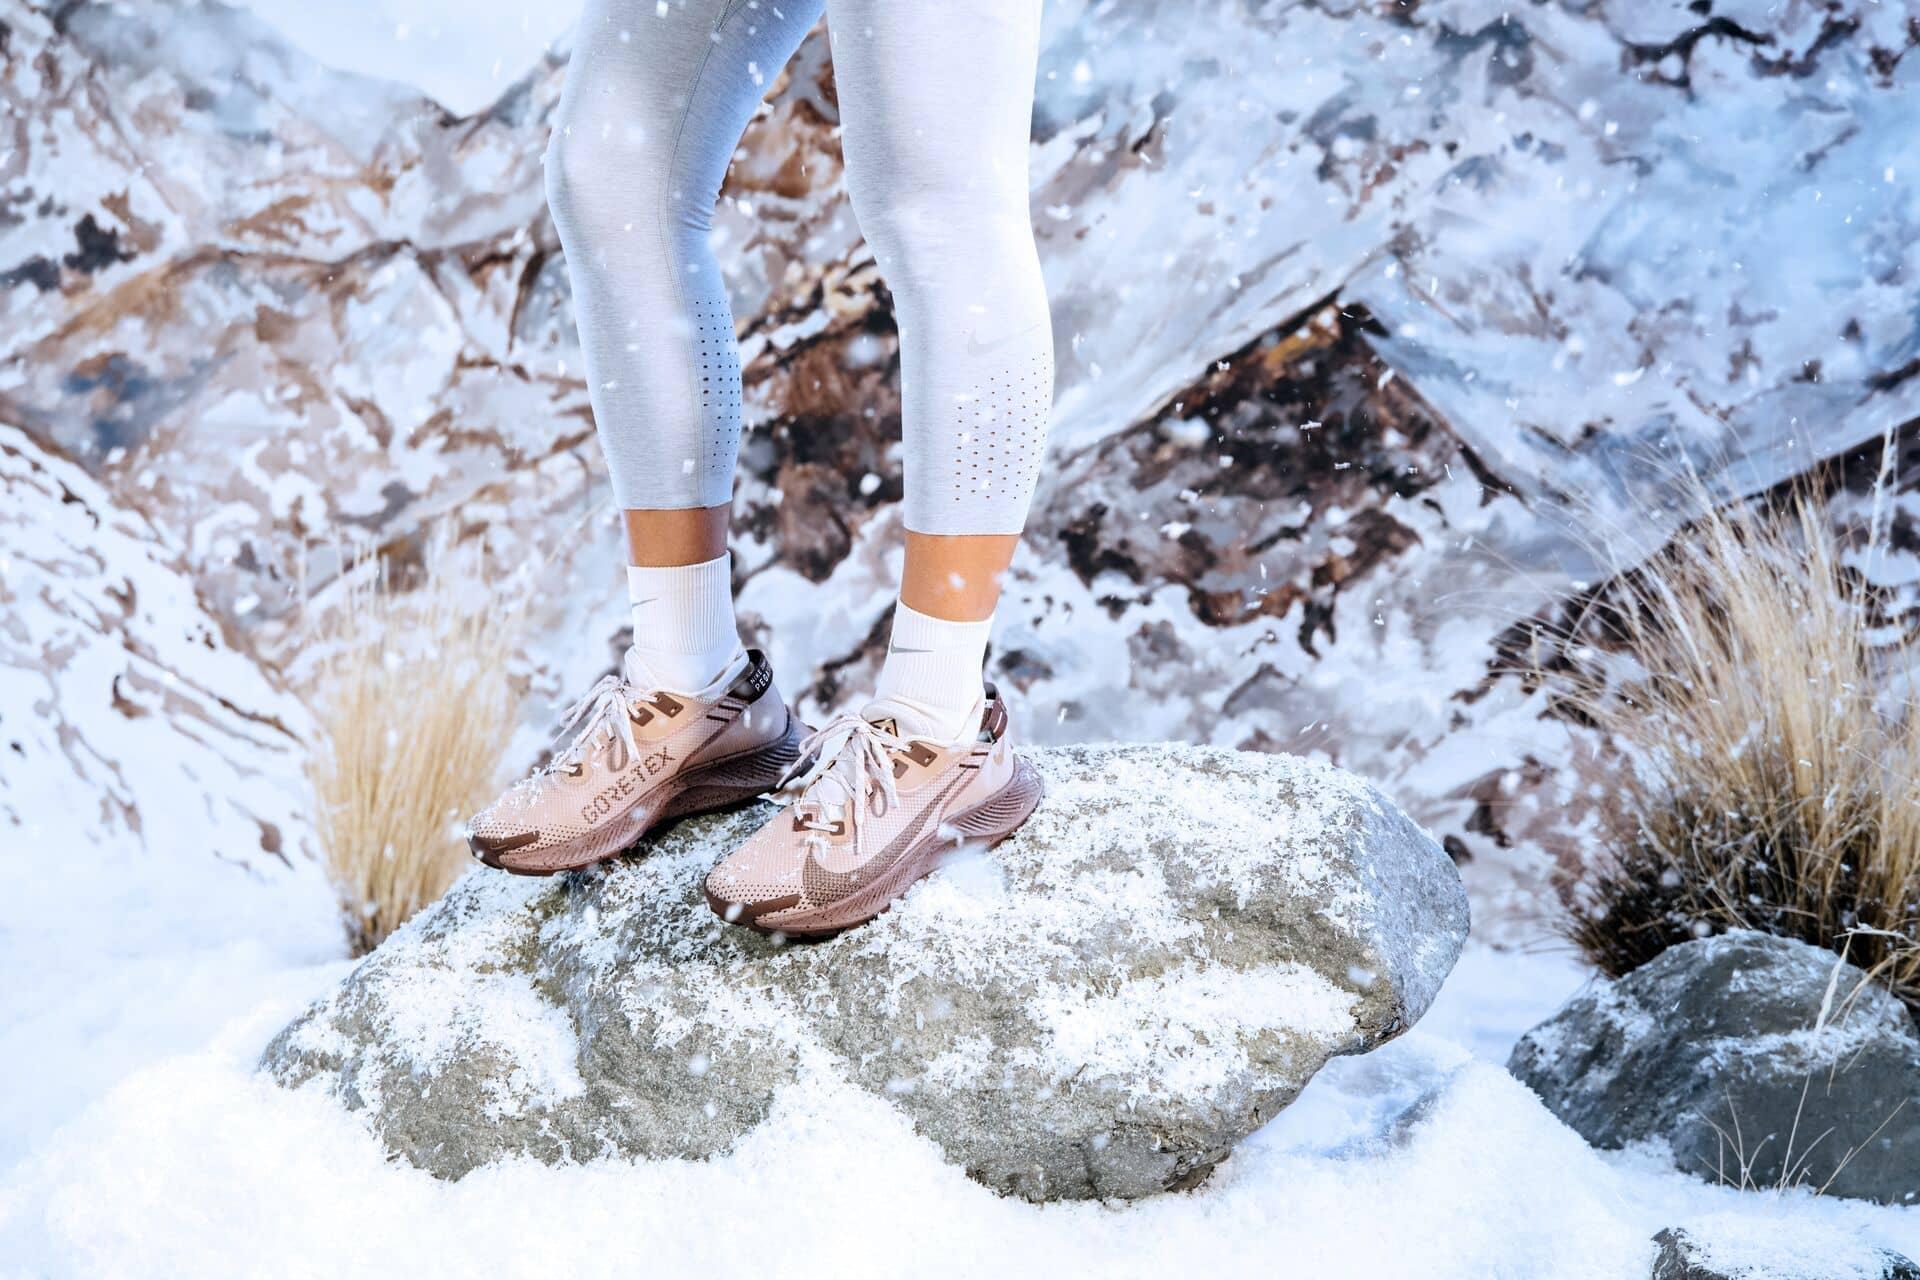 Que regarder avant de choisir vos chaussures de running d'hiver?